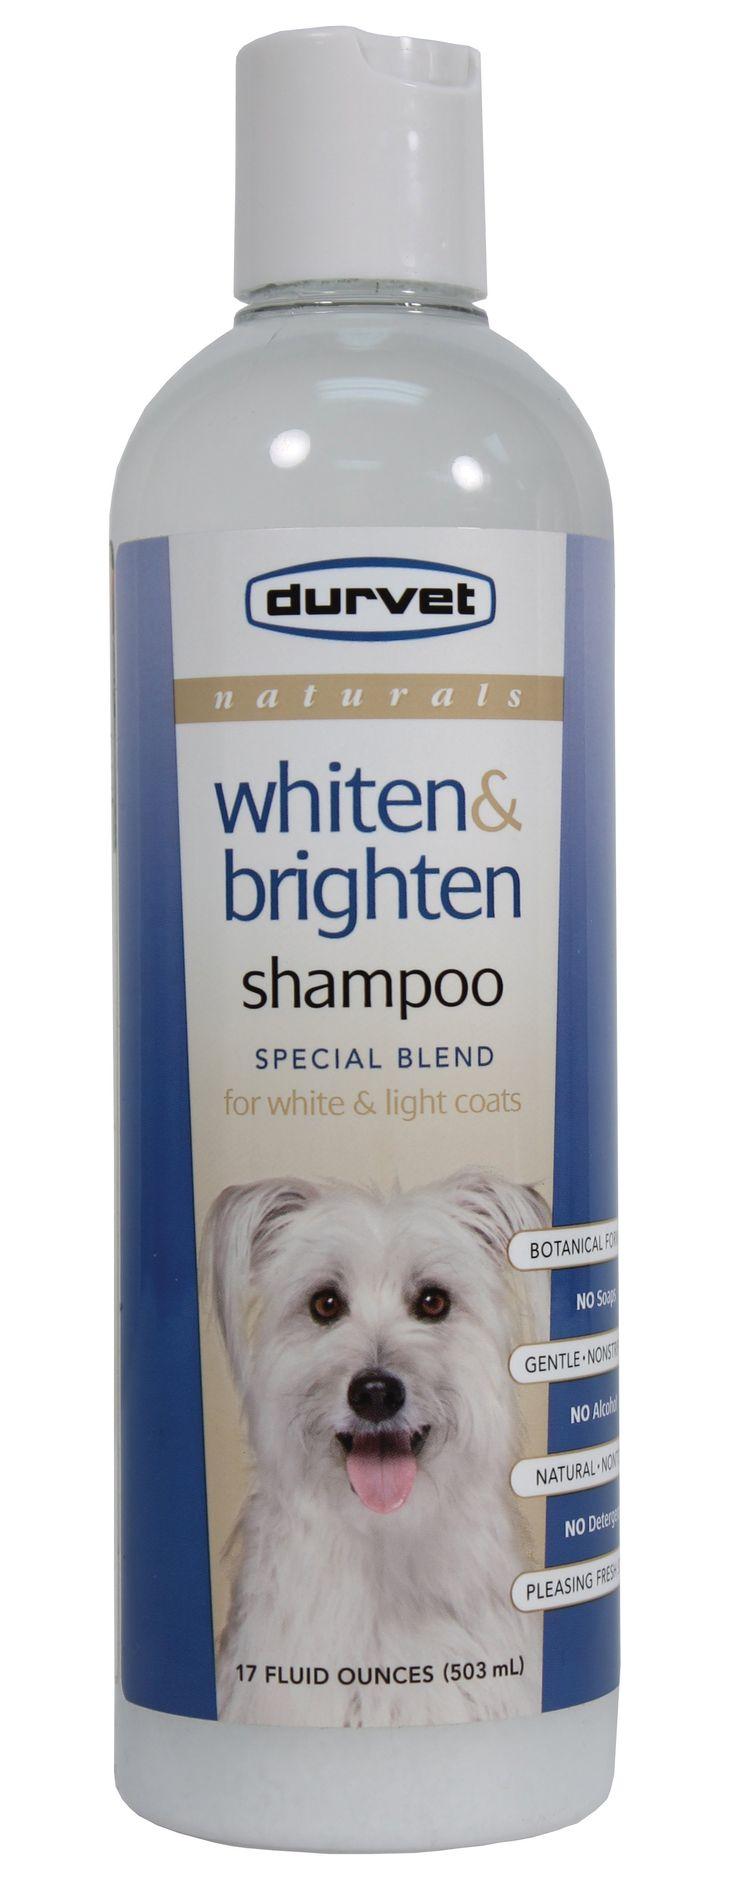 Durvet-Pet D-Naturals Pet Shampoo- Whiten/brighten 17 Oz